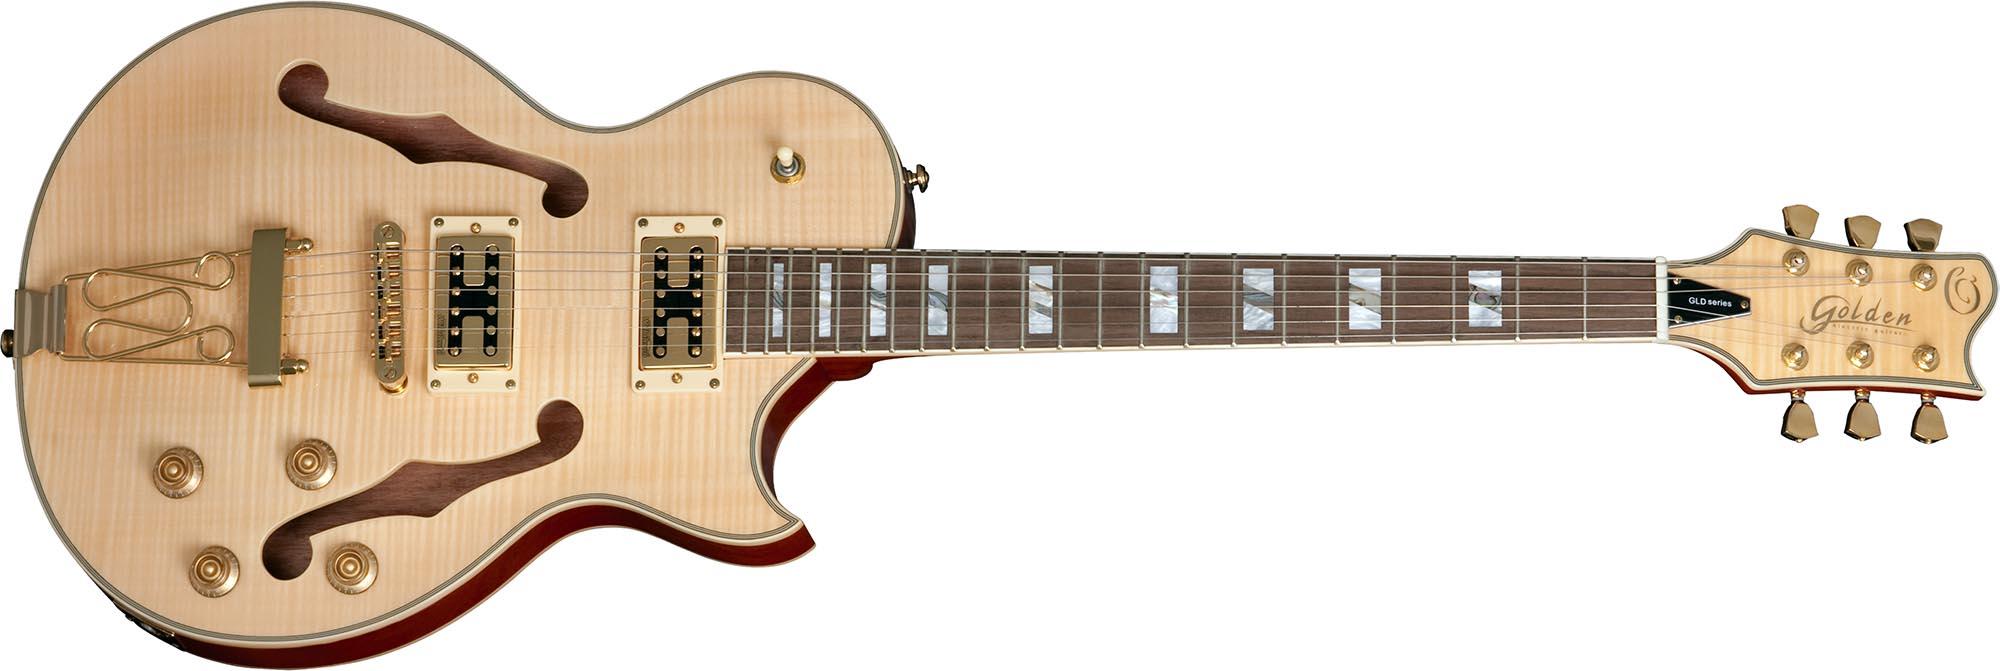 gsh570 guitarra eletrica les paul hollow body golden gsh570 nt natural visao frontal